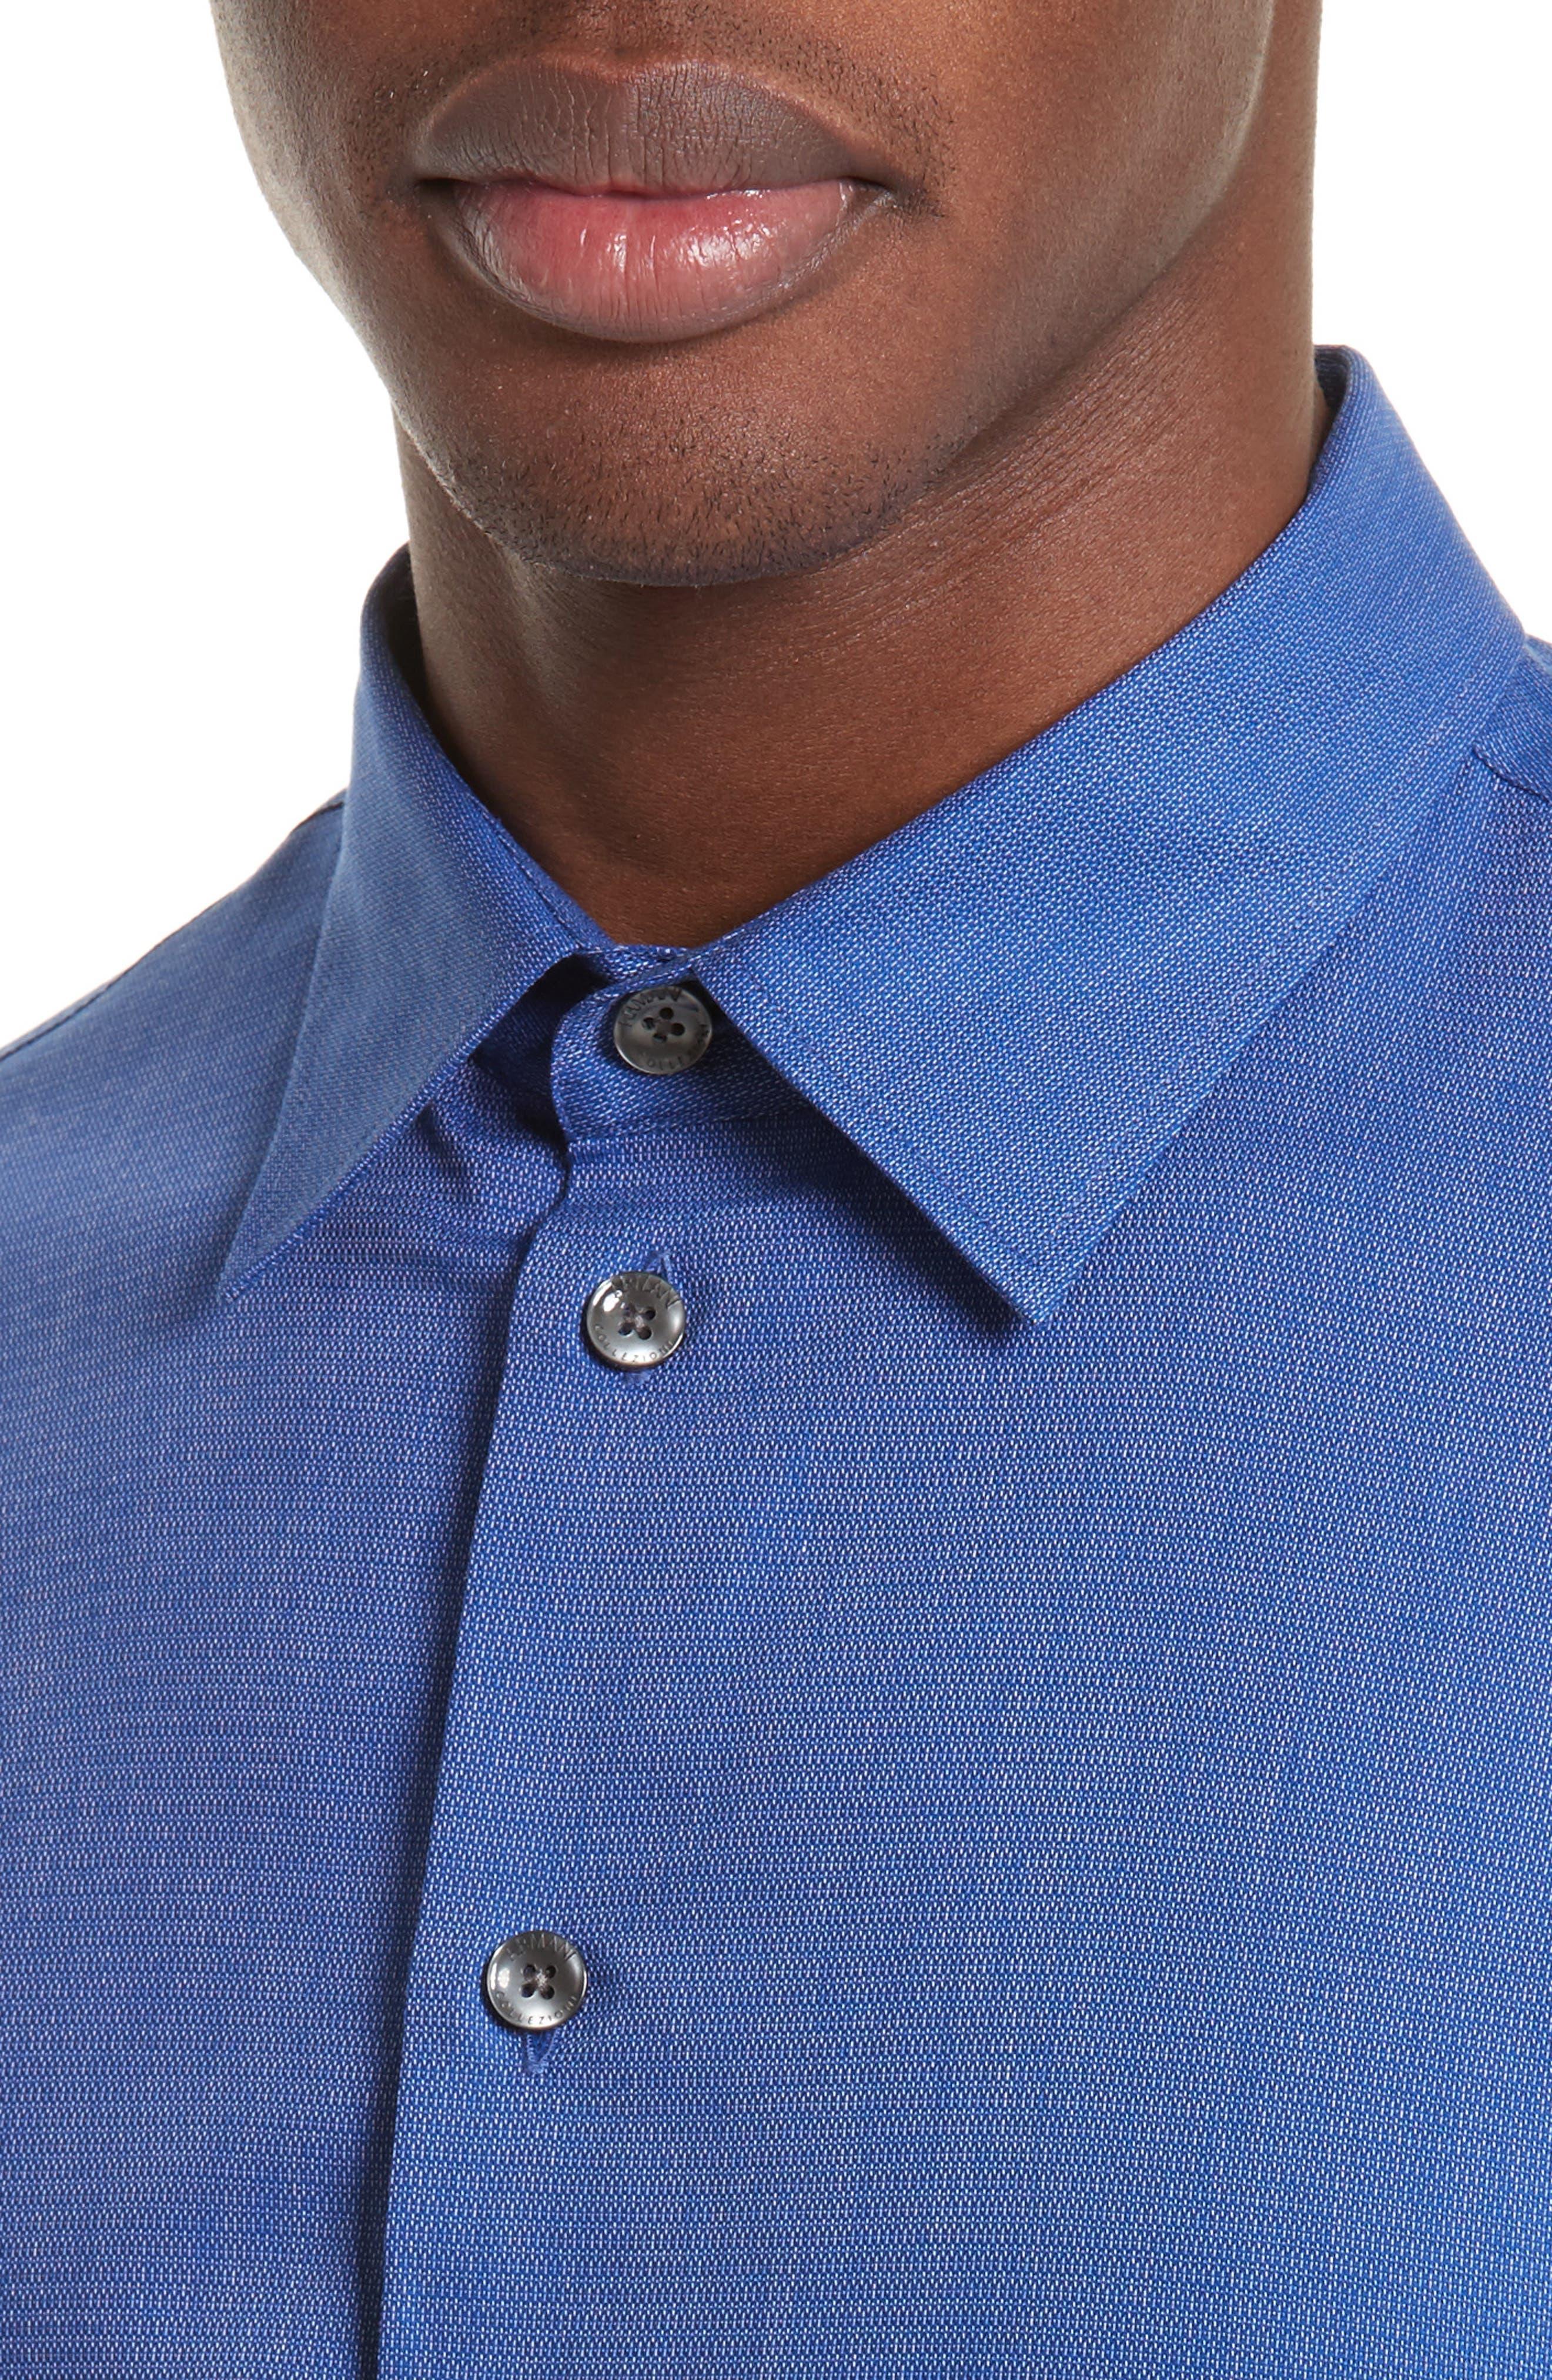 Regular Fit Woven Sport Shirt,                             Alternate thumbnail 4, color,                             415